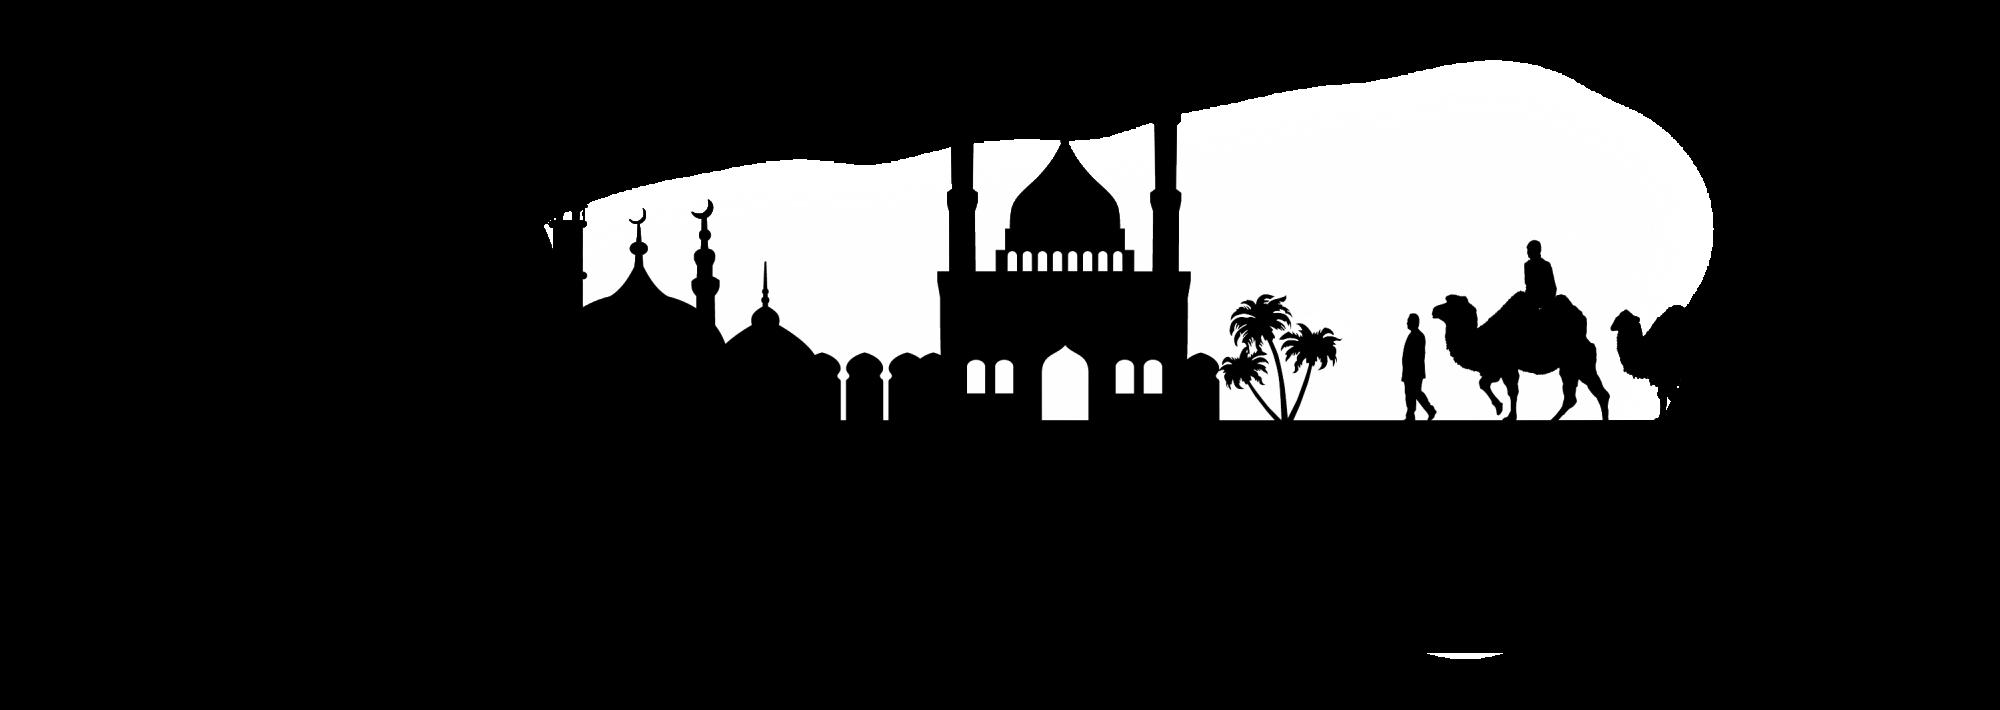 Mosque clipart arabic mosque, Picture #1679537 mosque.